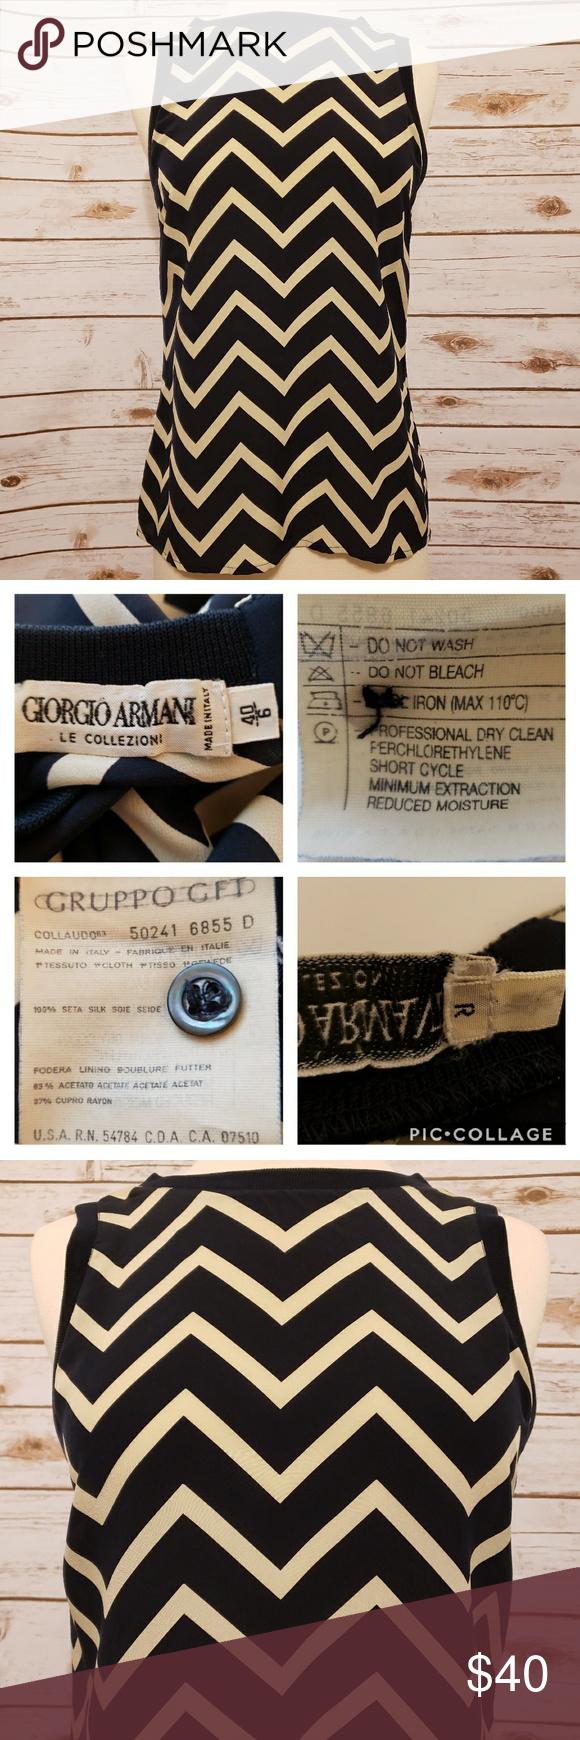 1640fd047b11a Vintage Armani 100% Italian Silk Chevron Blouse Vintage 100% silk blouse  made in Italy